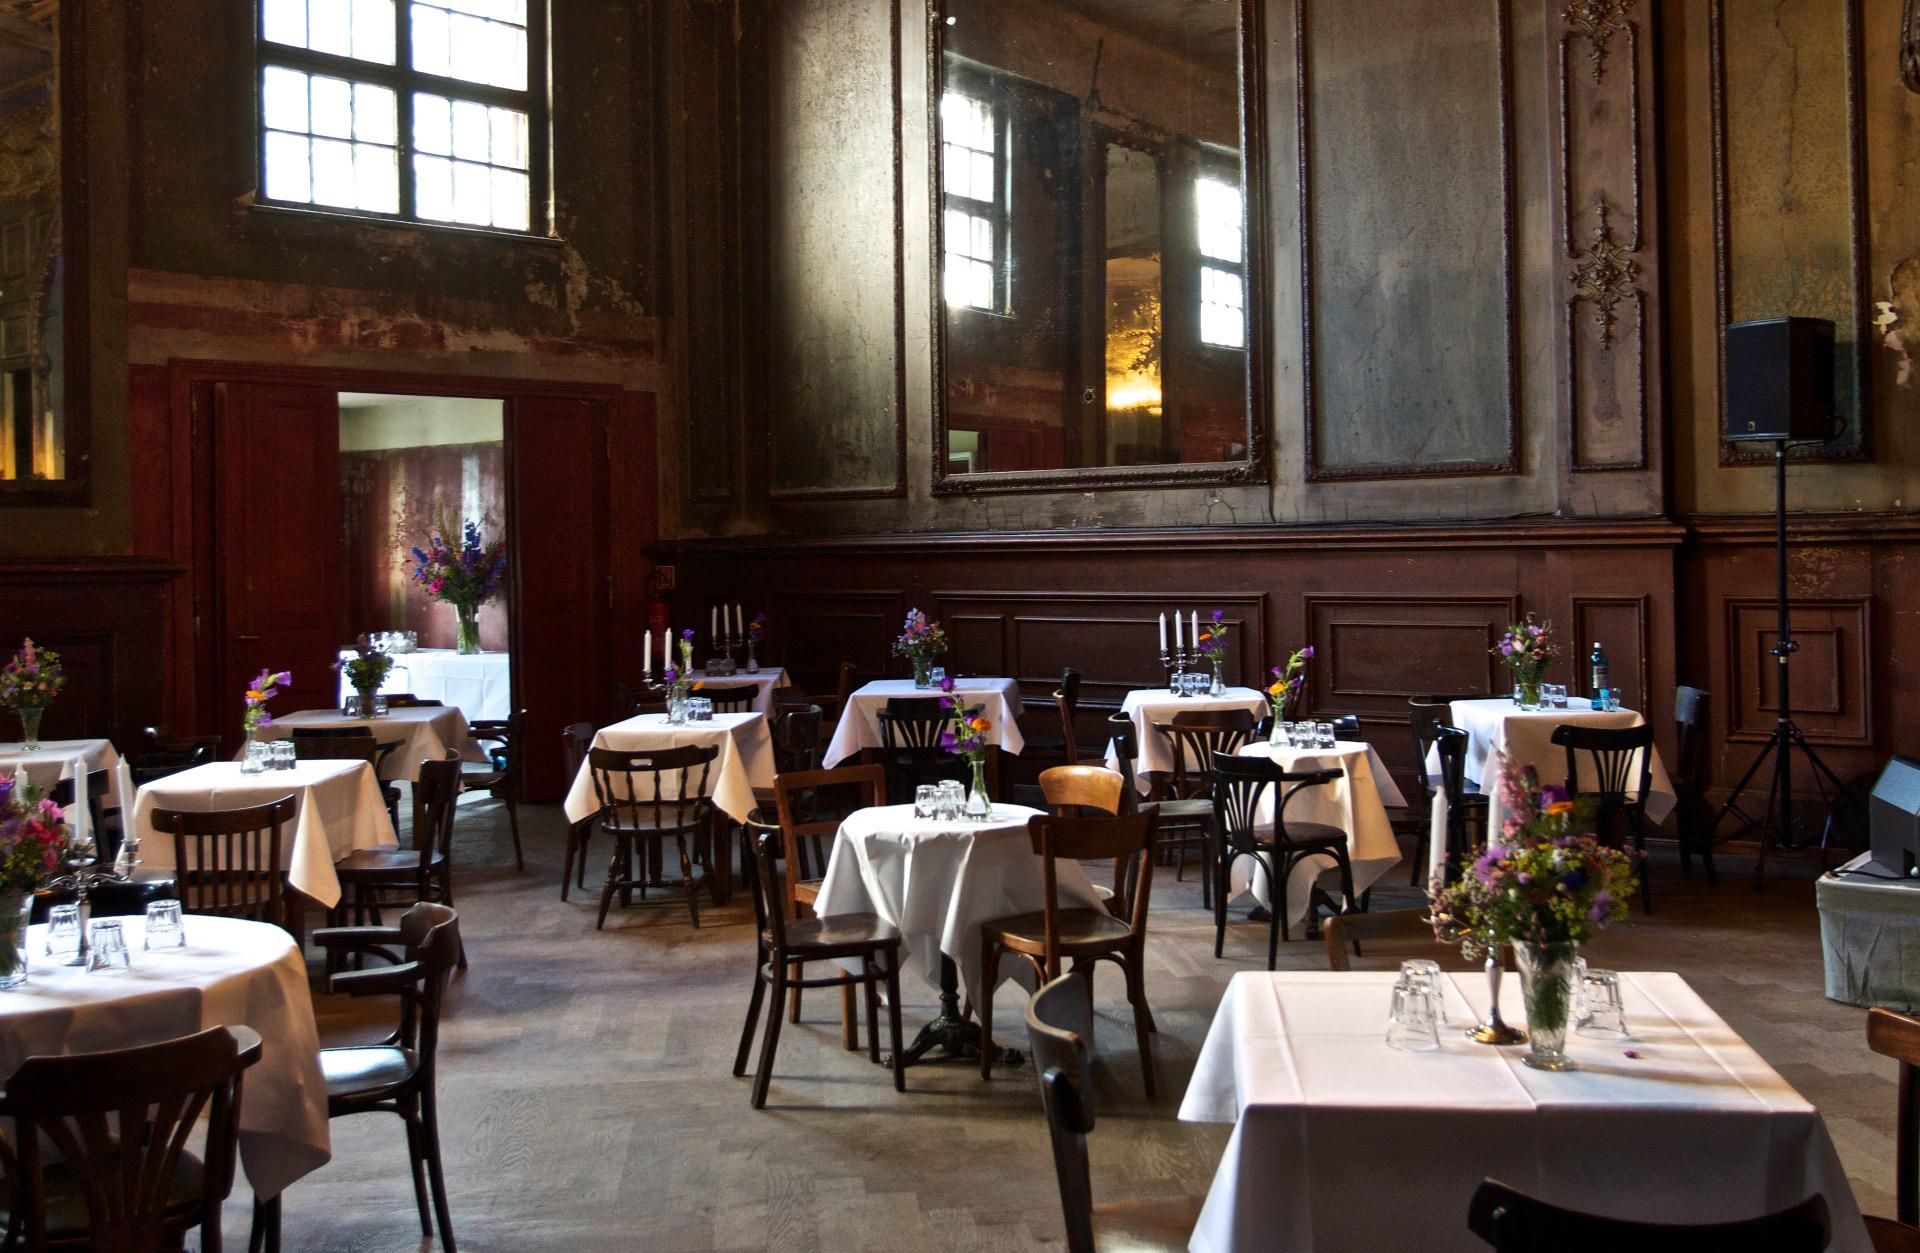 Hotel Concierge In Berlin